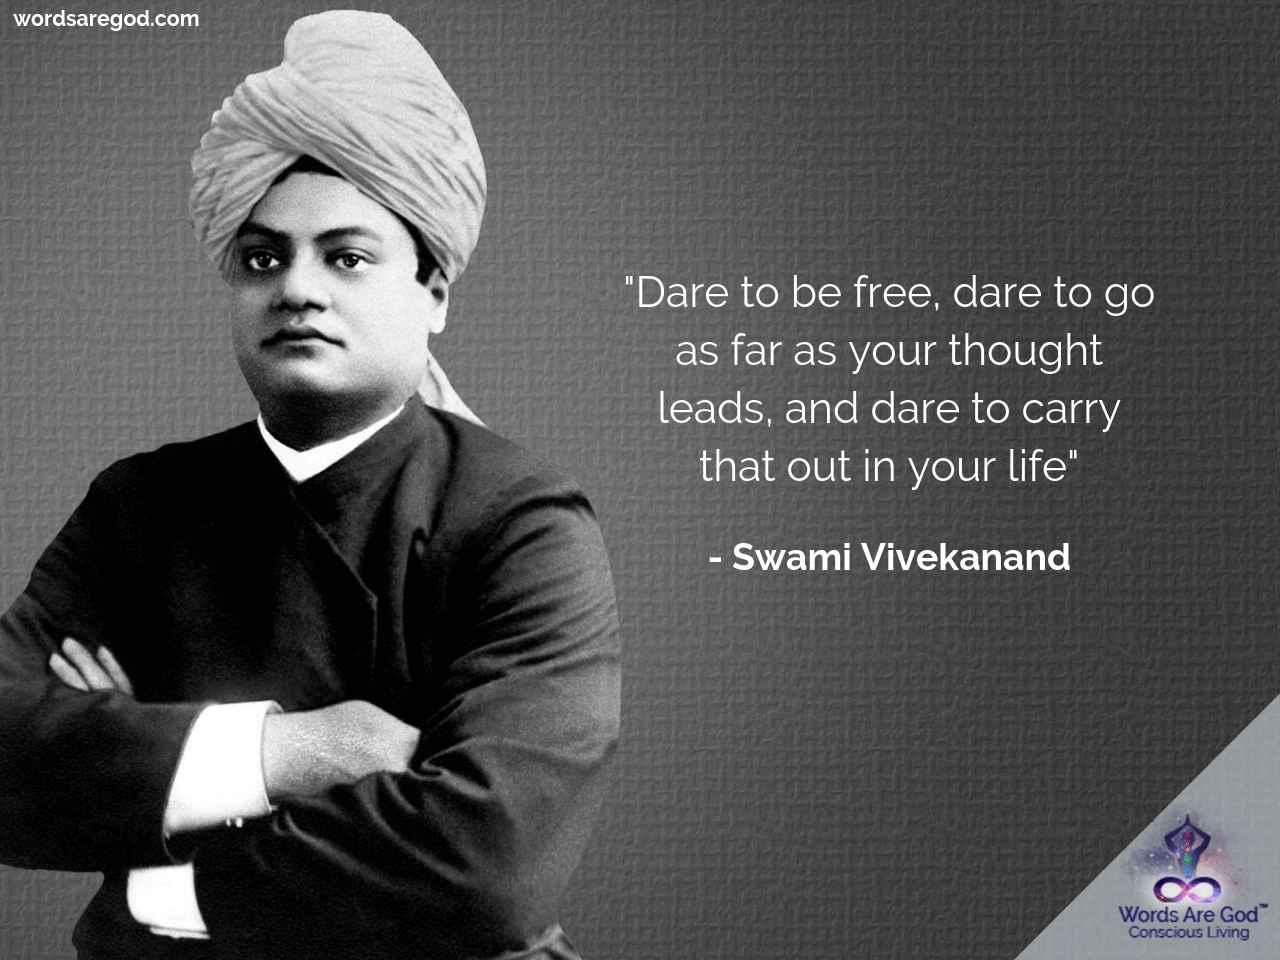 Swami Vivekanand Life Quote